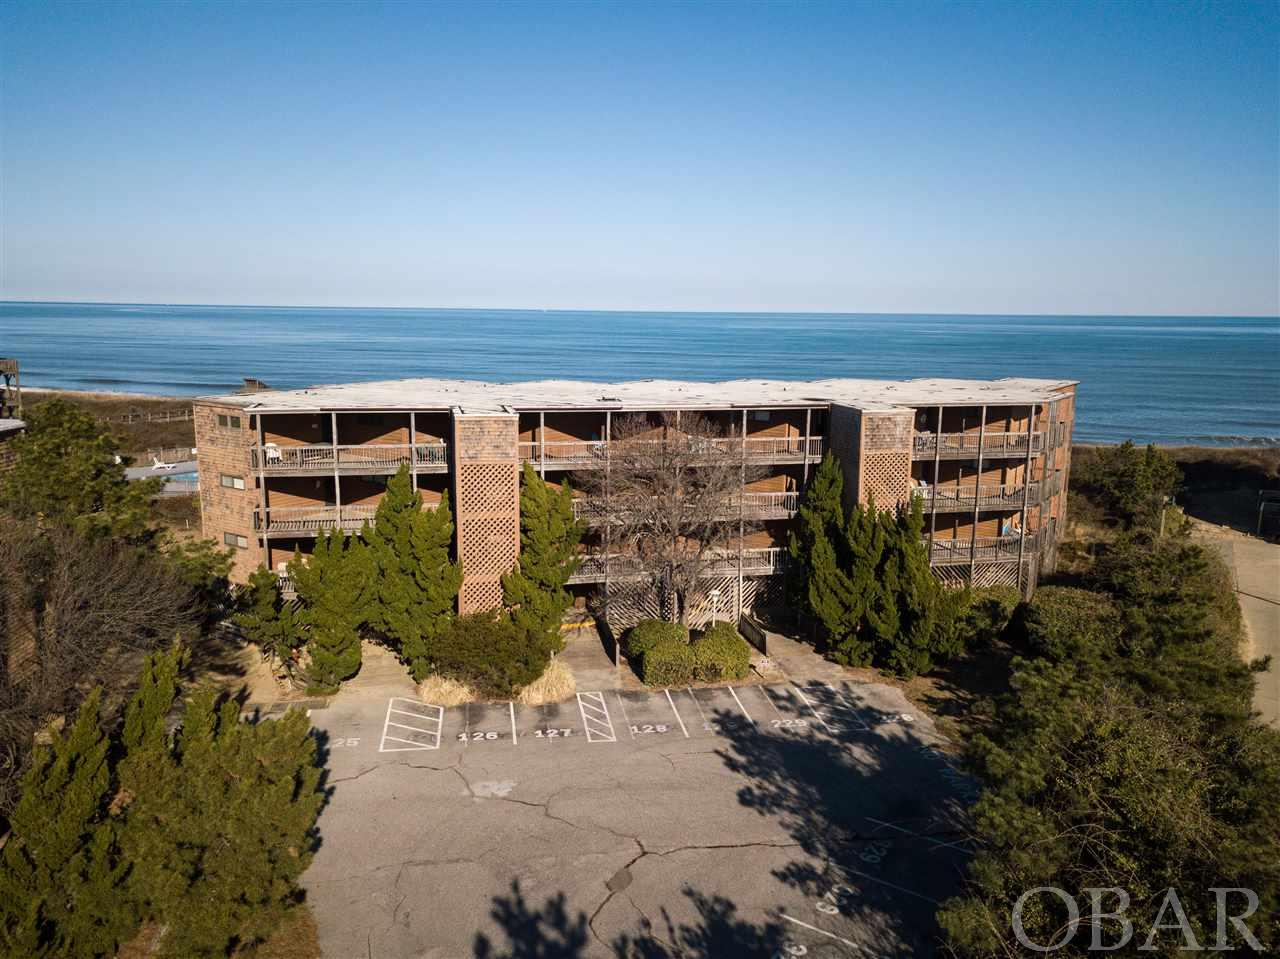 117 Sea Colony Drive,Duck,NC 27949,1 Bedroom Bedrooms,2 BathroomsBathrooms,Residential,Sea Colony Drive,99051